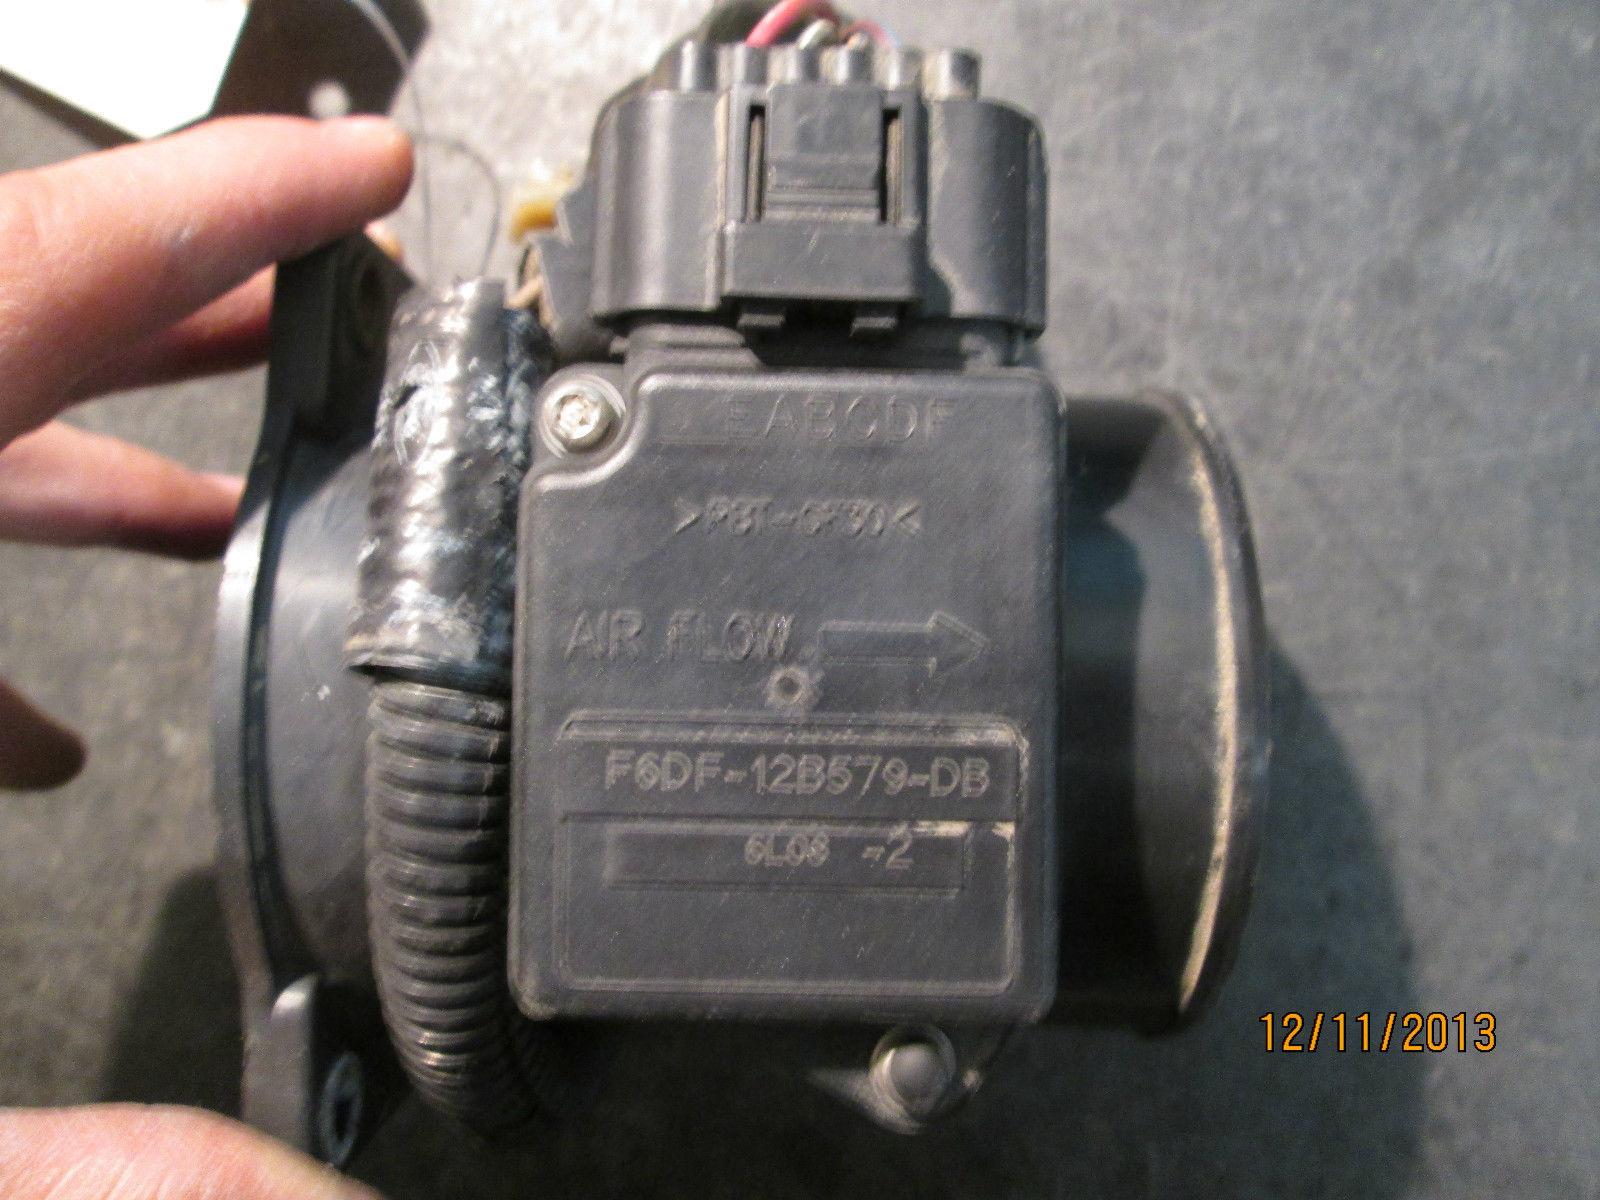 97 98 FORD AIR FLOW SENSOR #F6DF-12B579-DB *See item description*